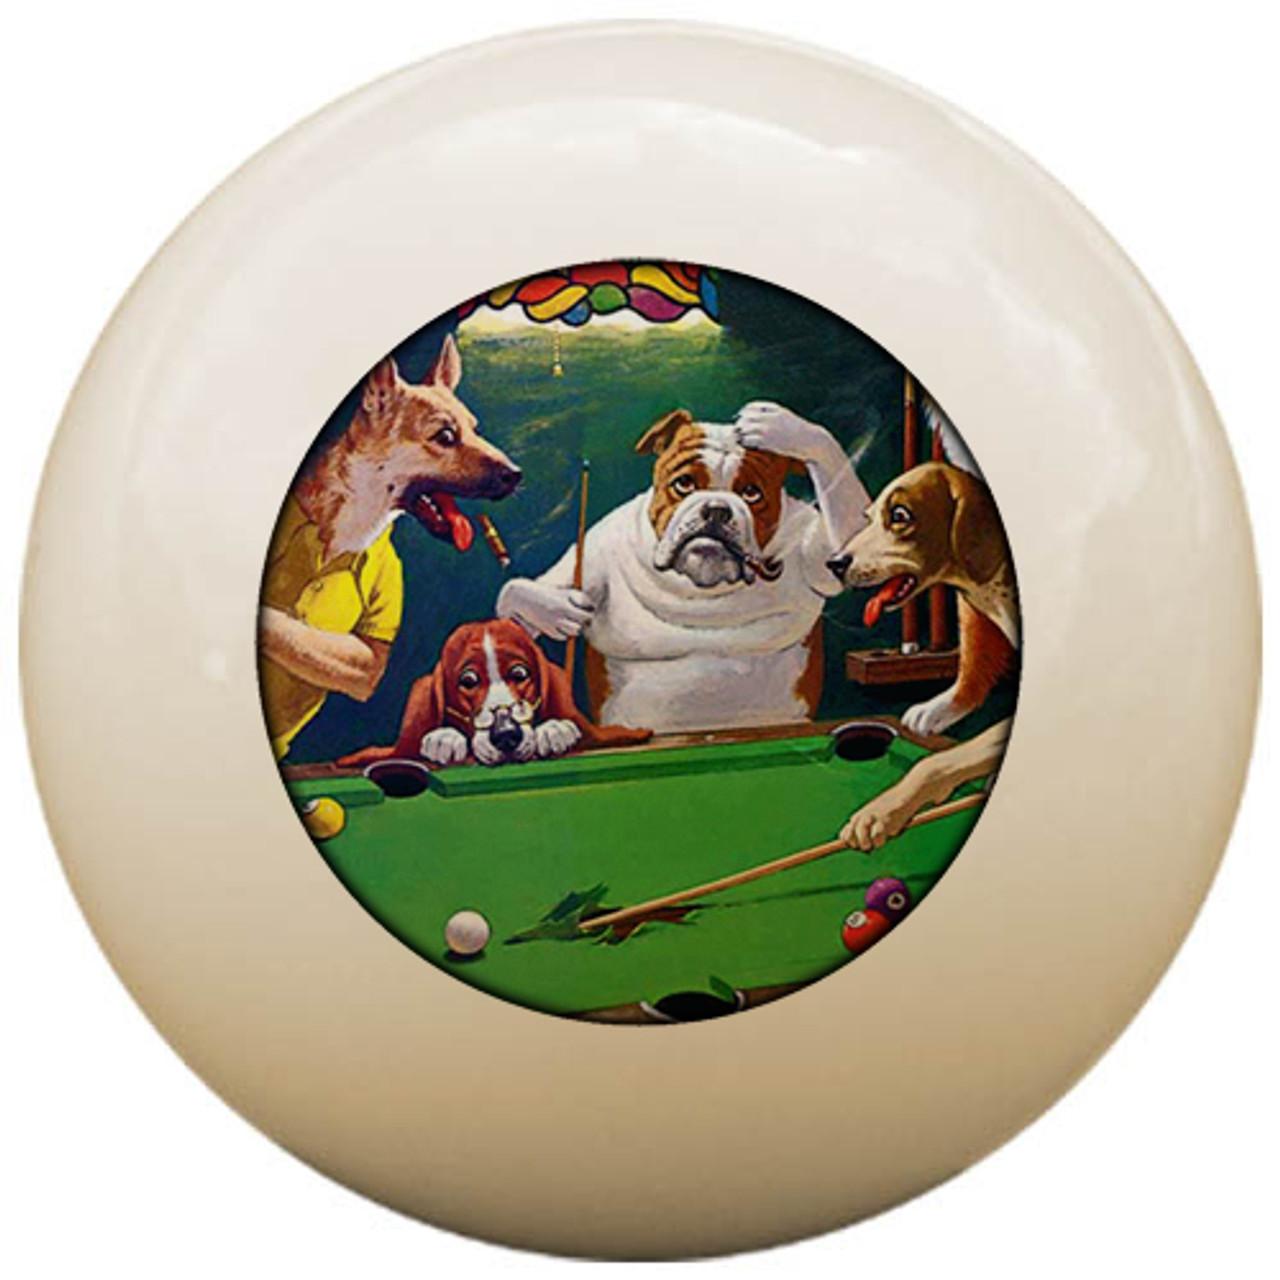 Custom Pool Cue Ball - Dogs Playing Pool